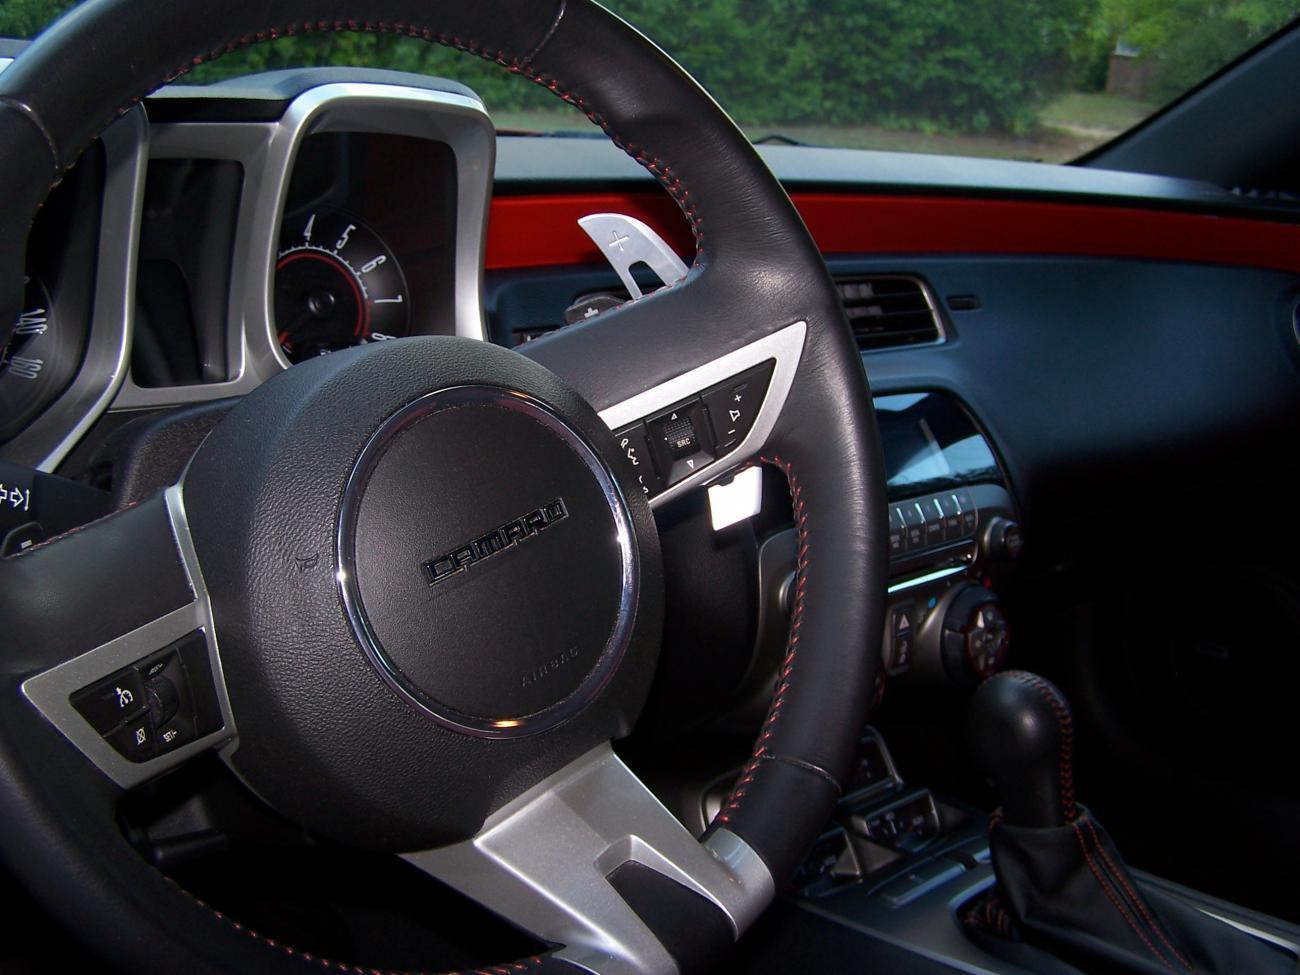 vitesse paddle shifters 2012 camaro camaro5 chevy camaro. Black Bedroom Furniture Sets. Home Design Ideas